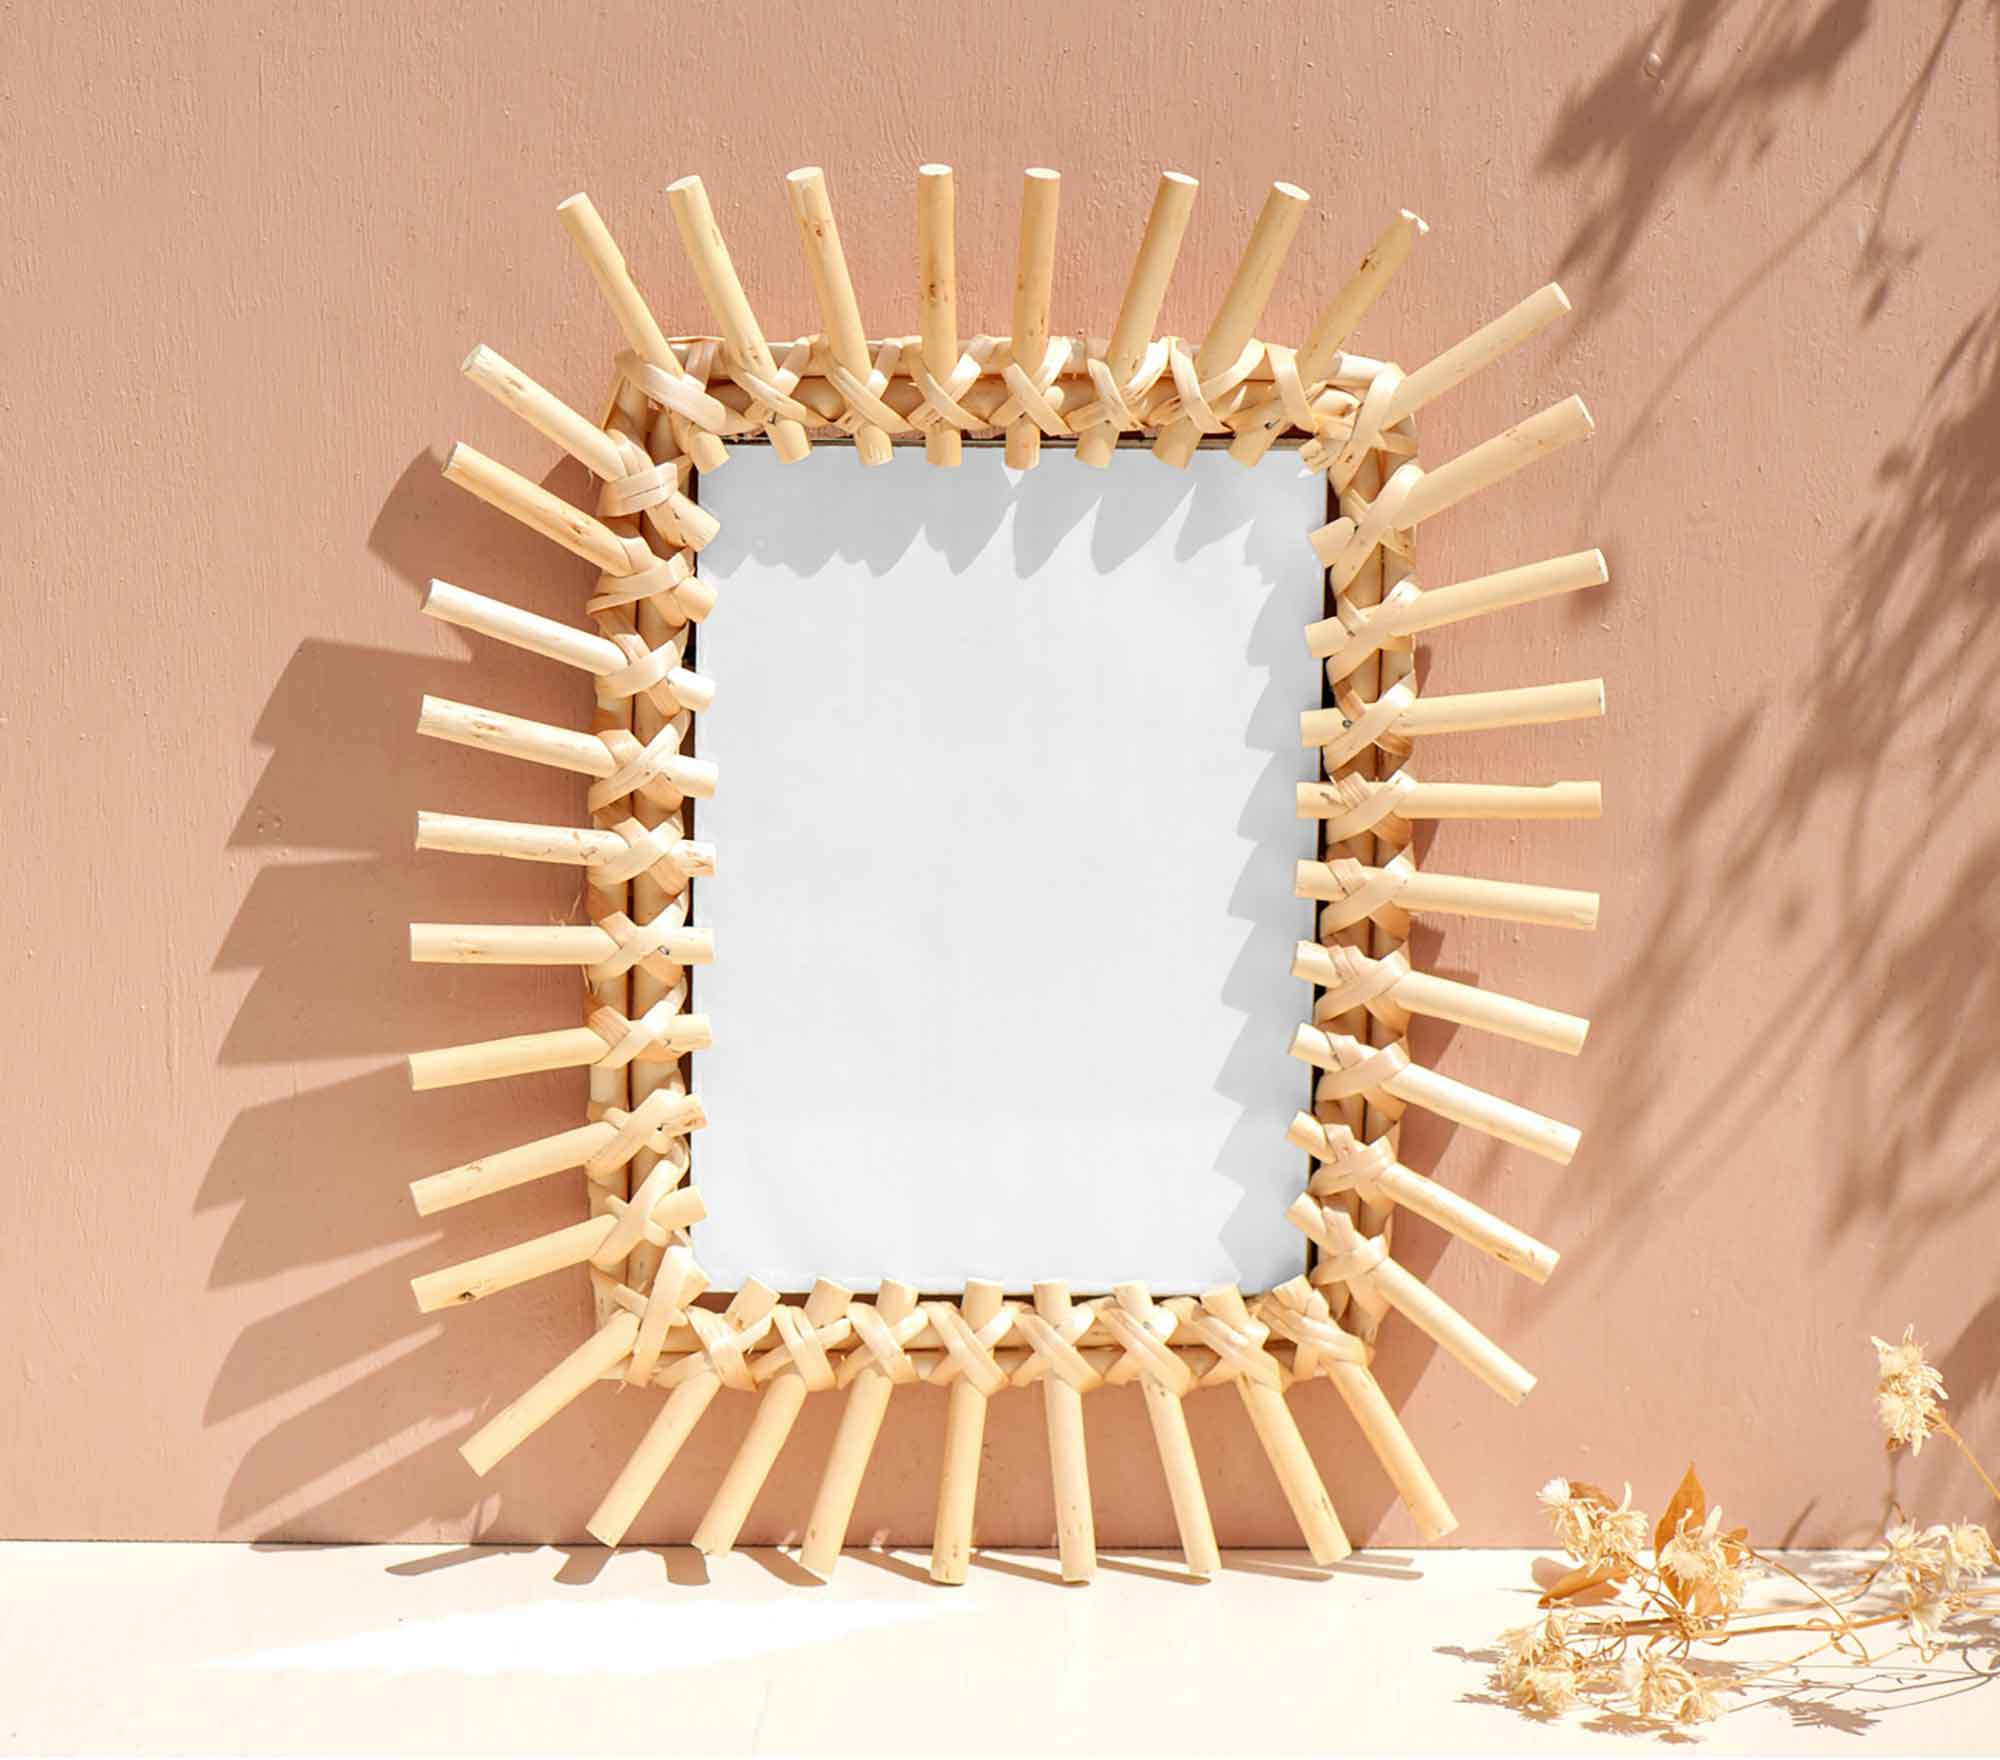 Bamboo Frame Mockup 2